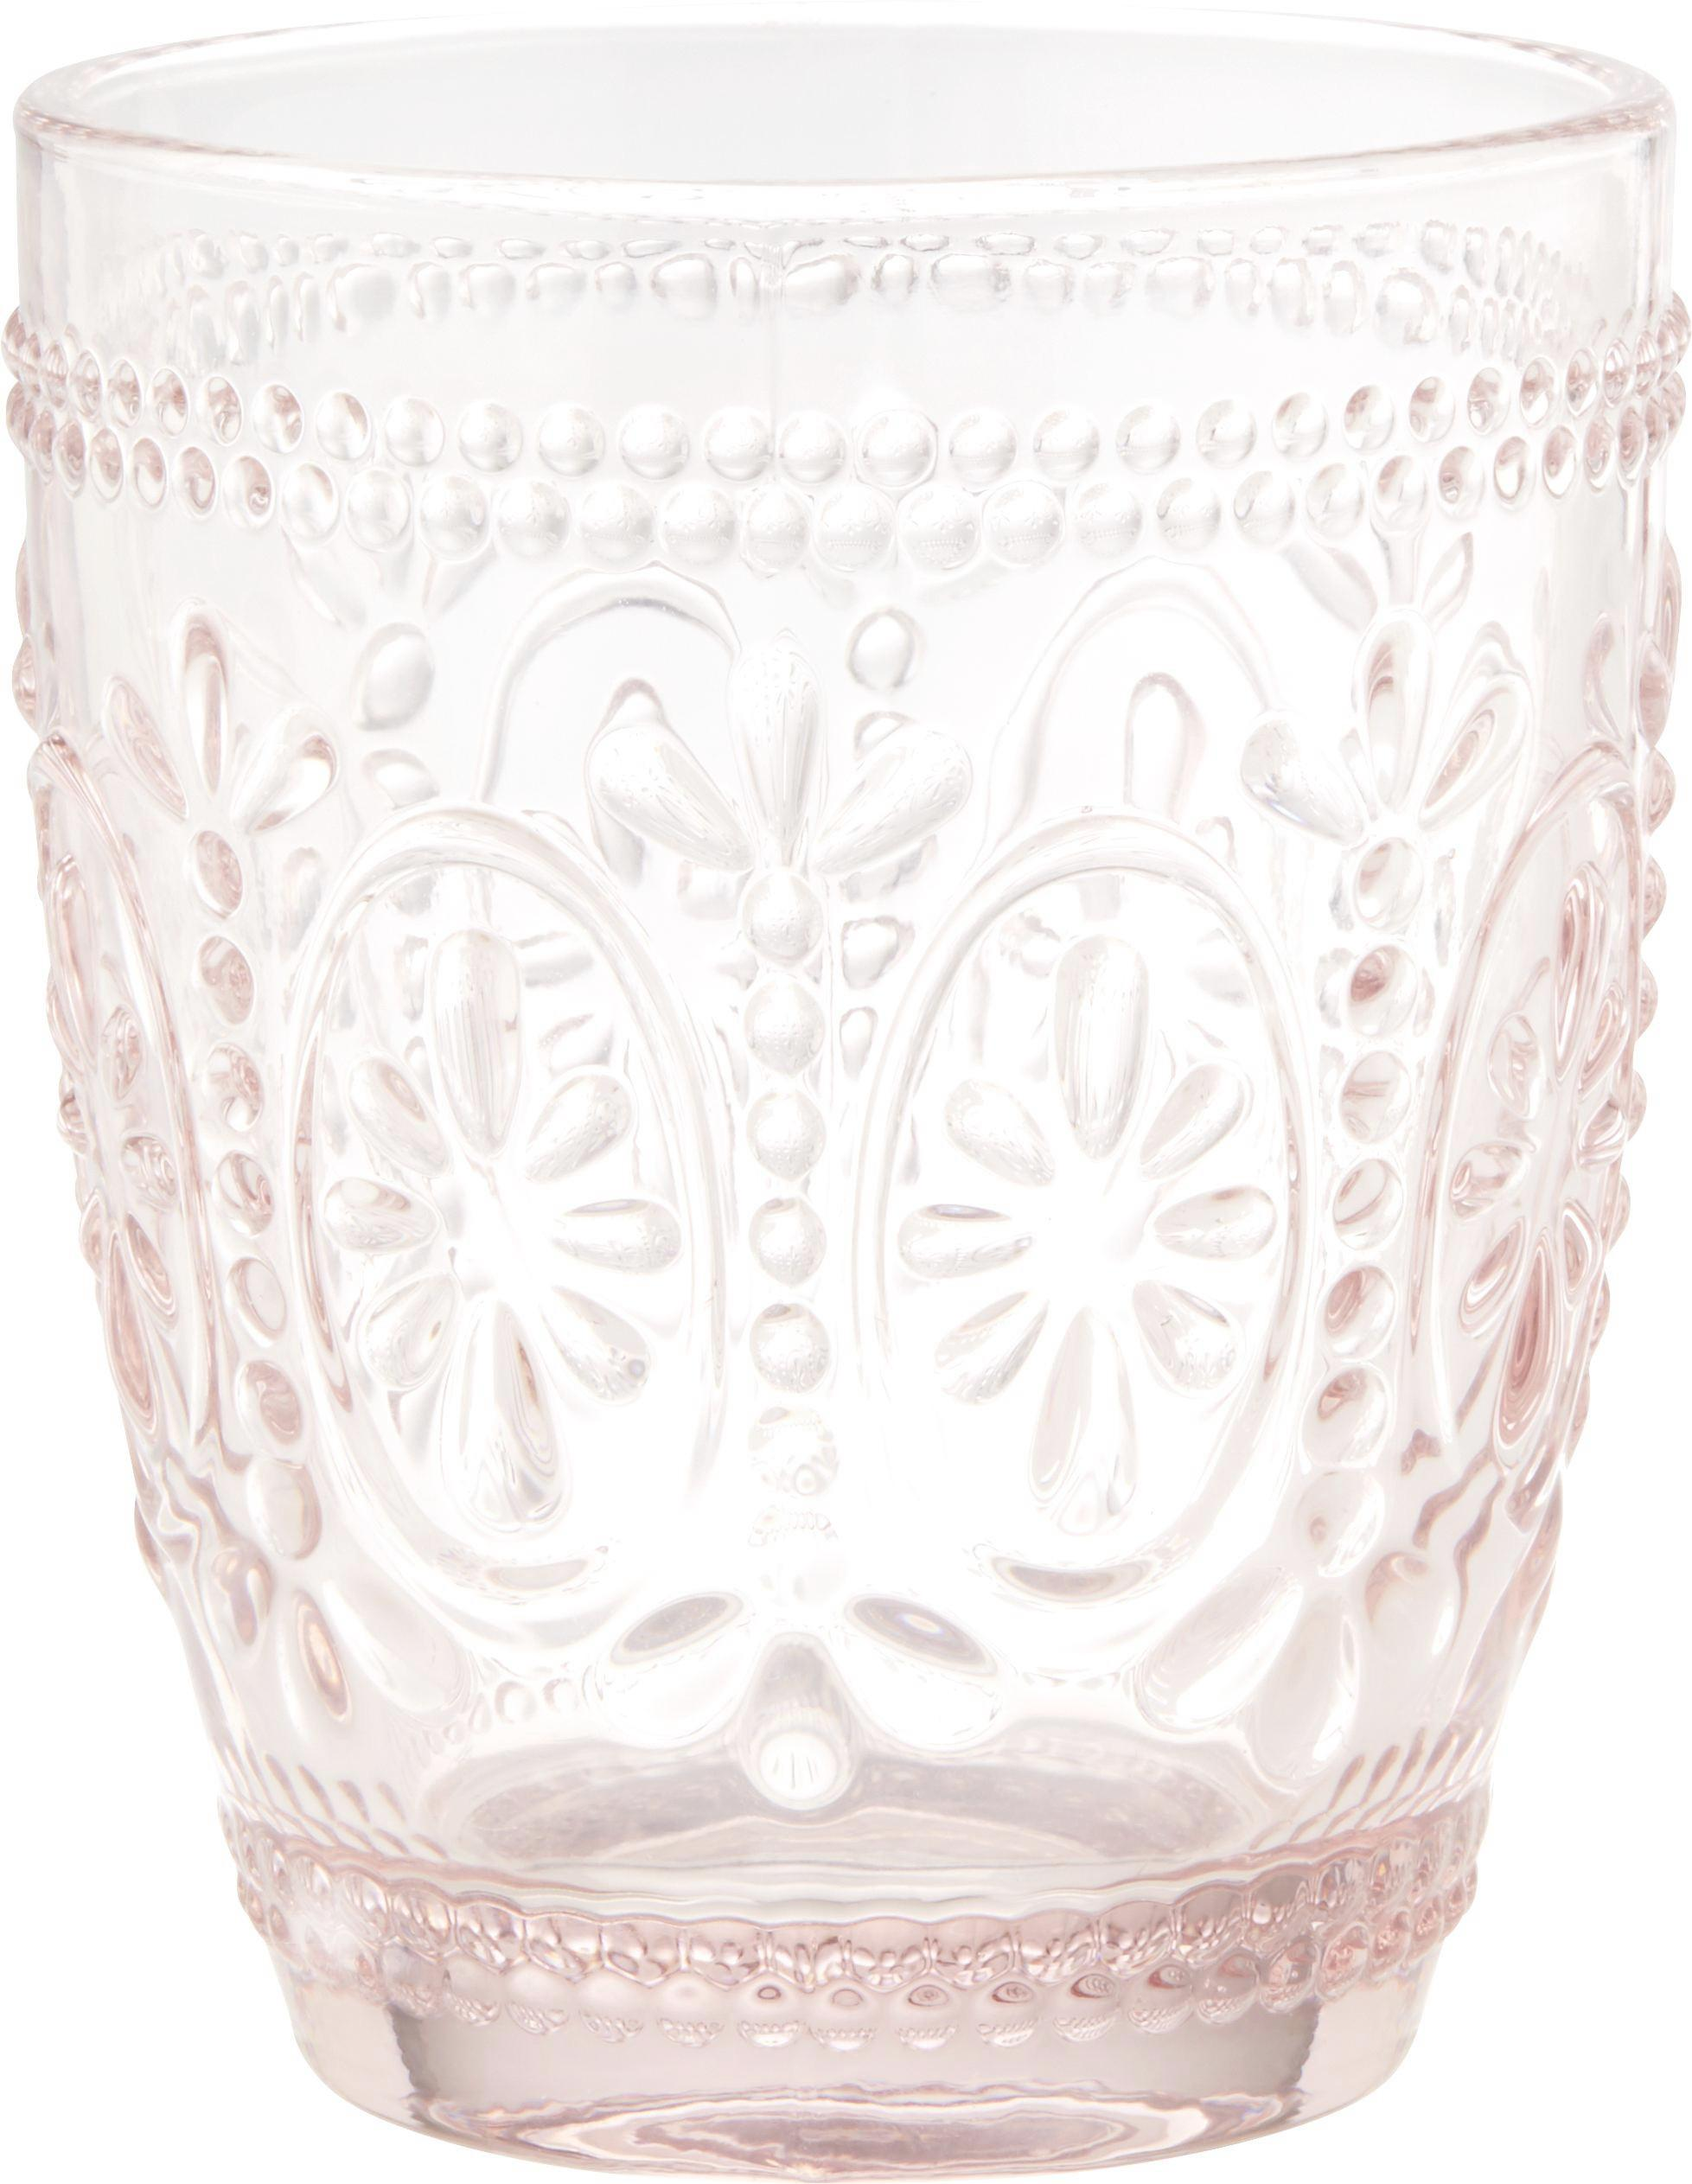 Wasserglas St. Remy in Rosa, ca. 300ml - Rosa, ROMANTIK / LANDHAUS, Glas (8,1/9,8cm) - MÖMAX modern living